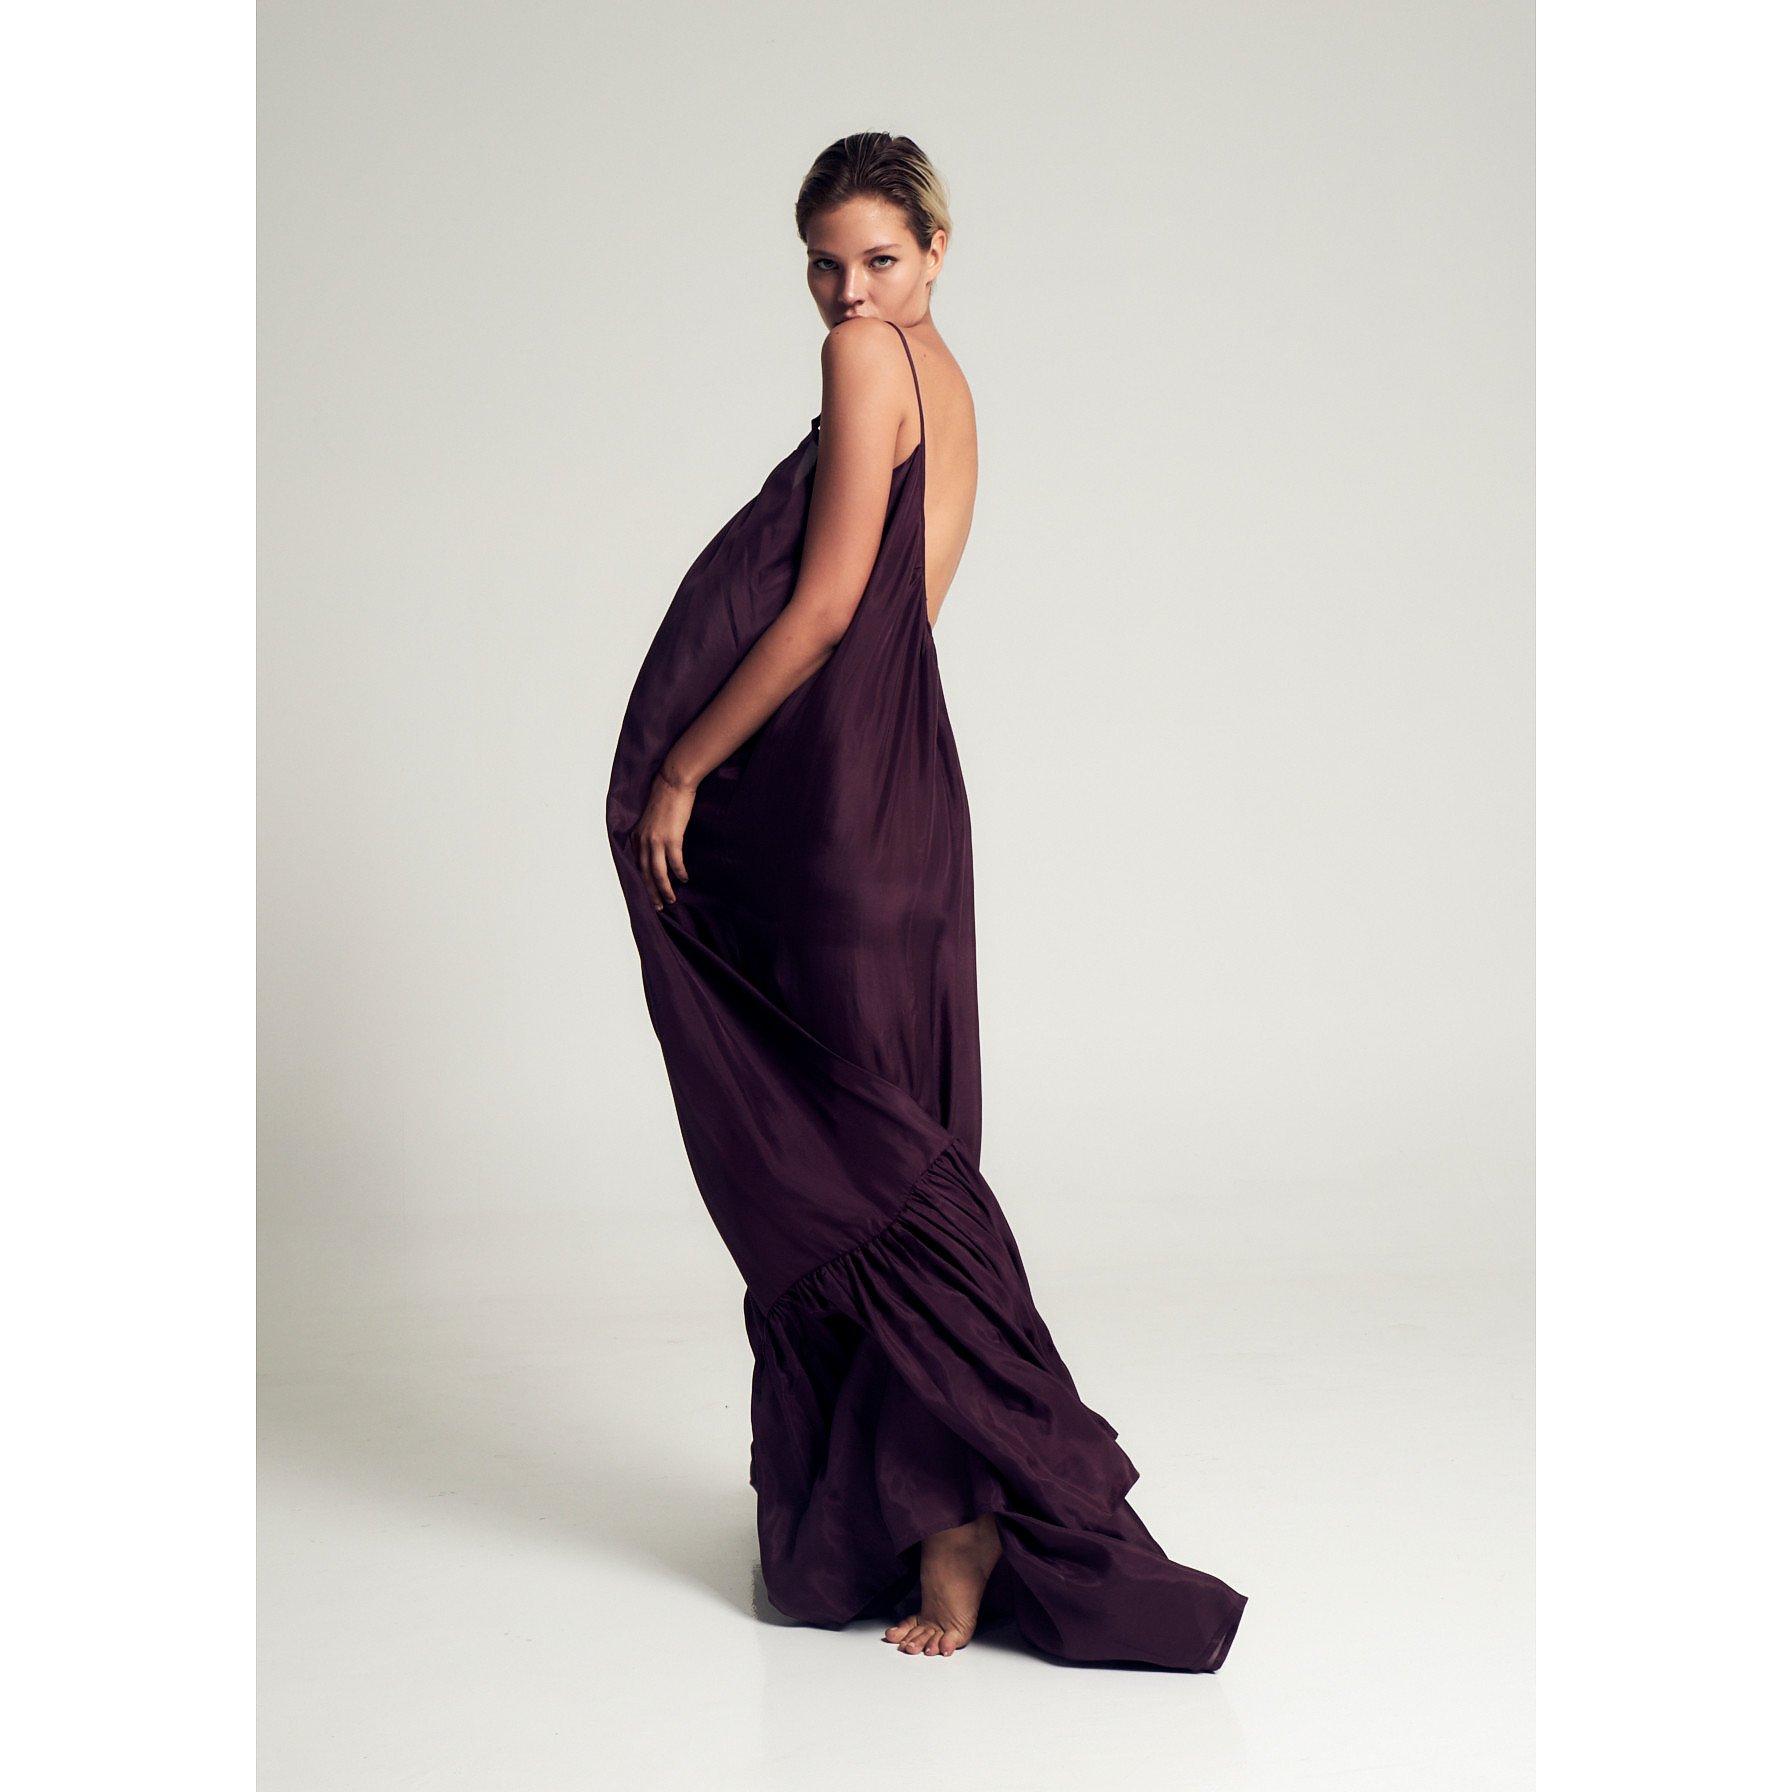 Kalita Brigitte Maxi Dress Press Sample